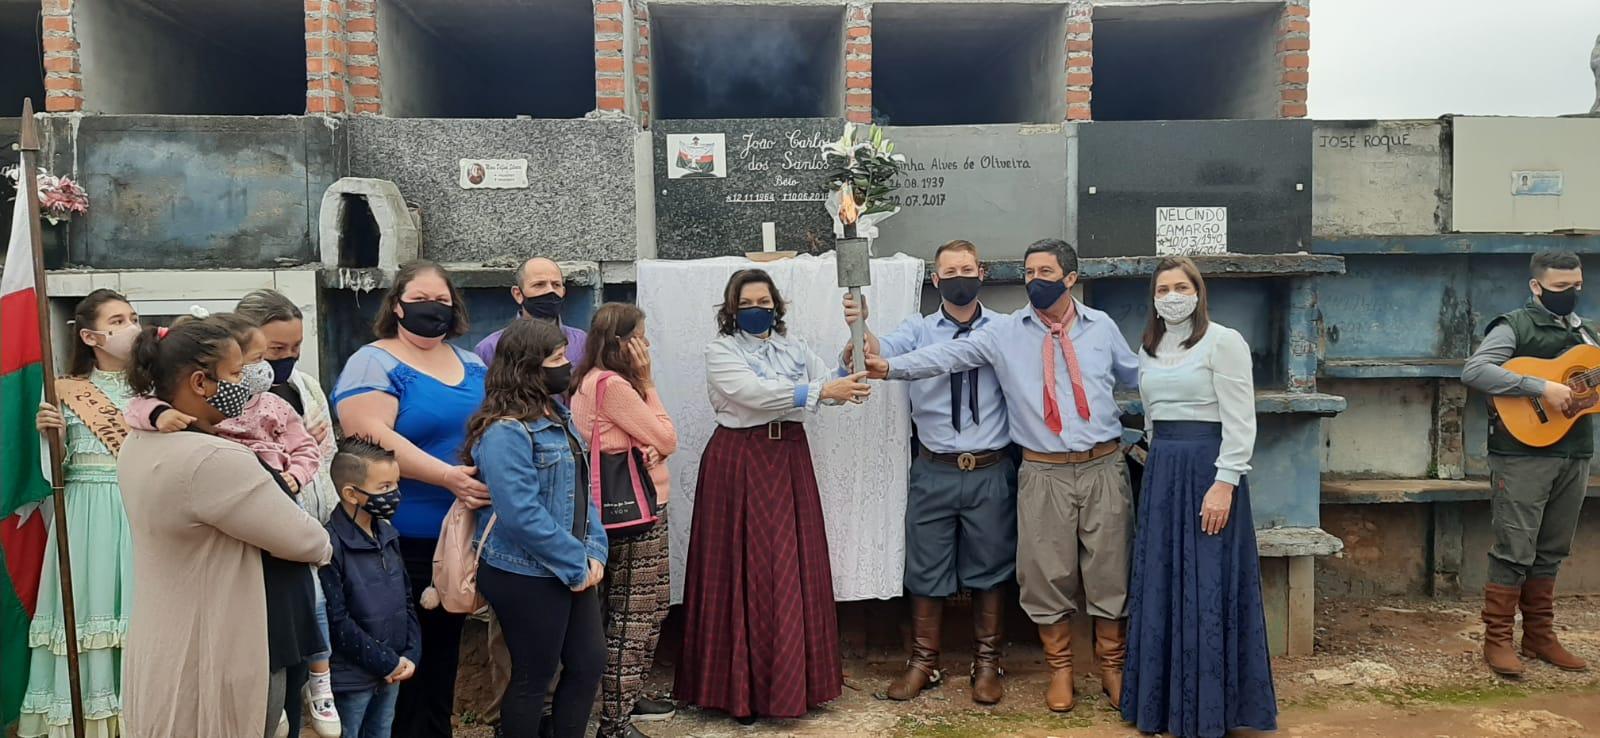 Espumoso: Aberta oficialmente a Semana Farroupilha do G.A.N Sepé Tiaraju